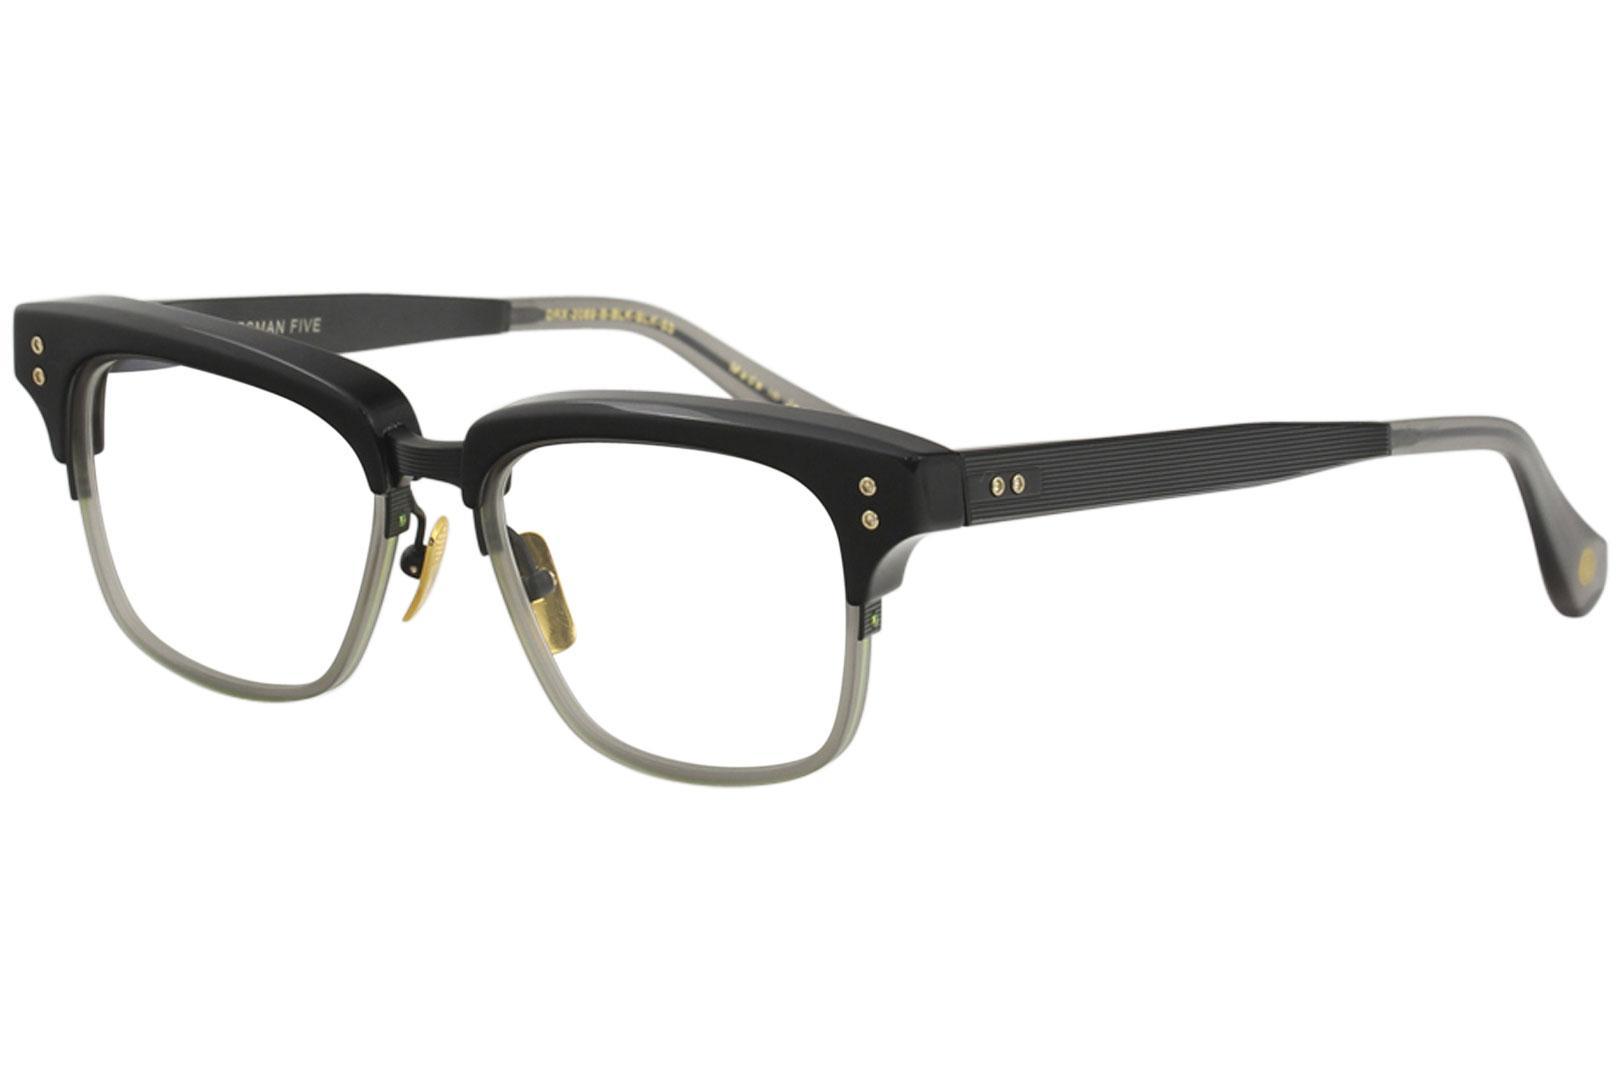 cb7bfcecfe71 Dita Men s Eyeglasses Statesman-Five DRX-2089 Full Rim Optical Frame